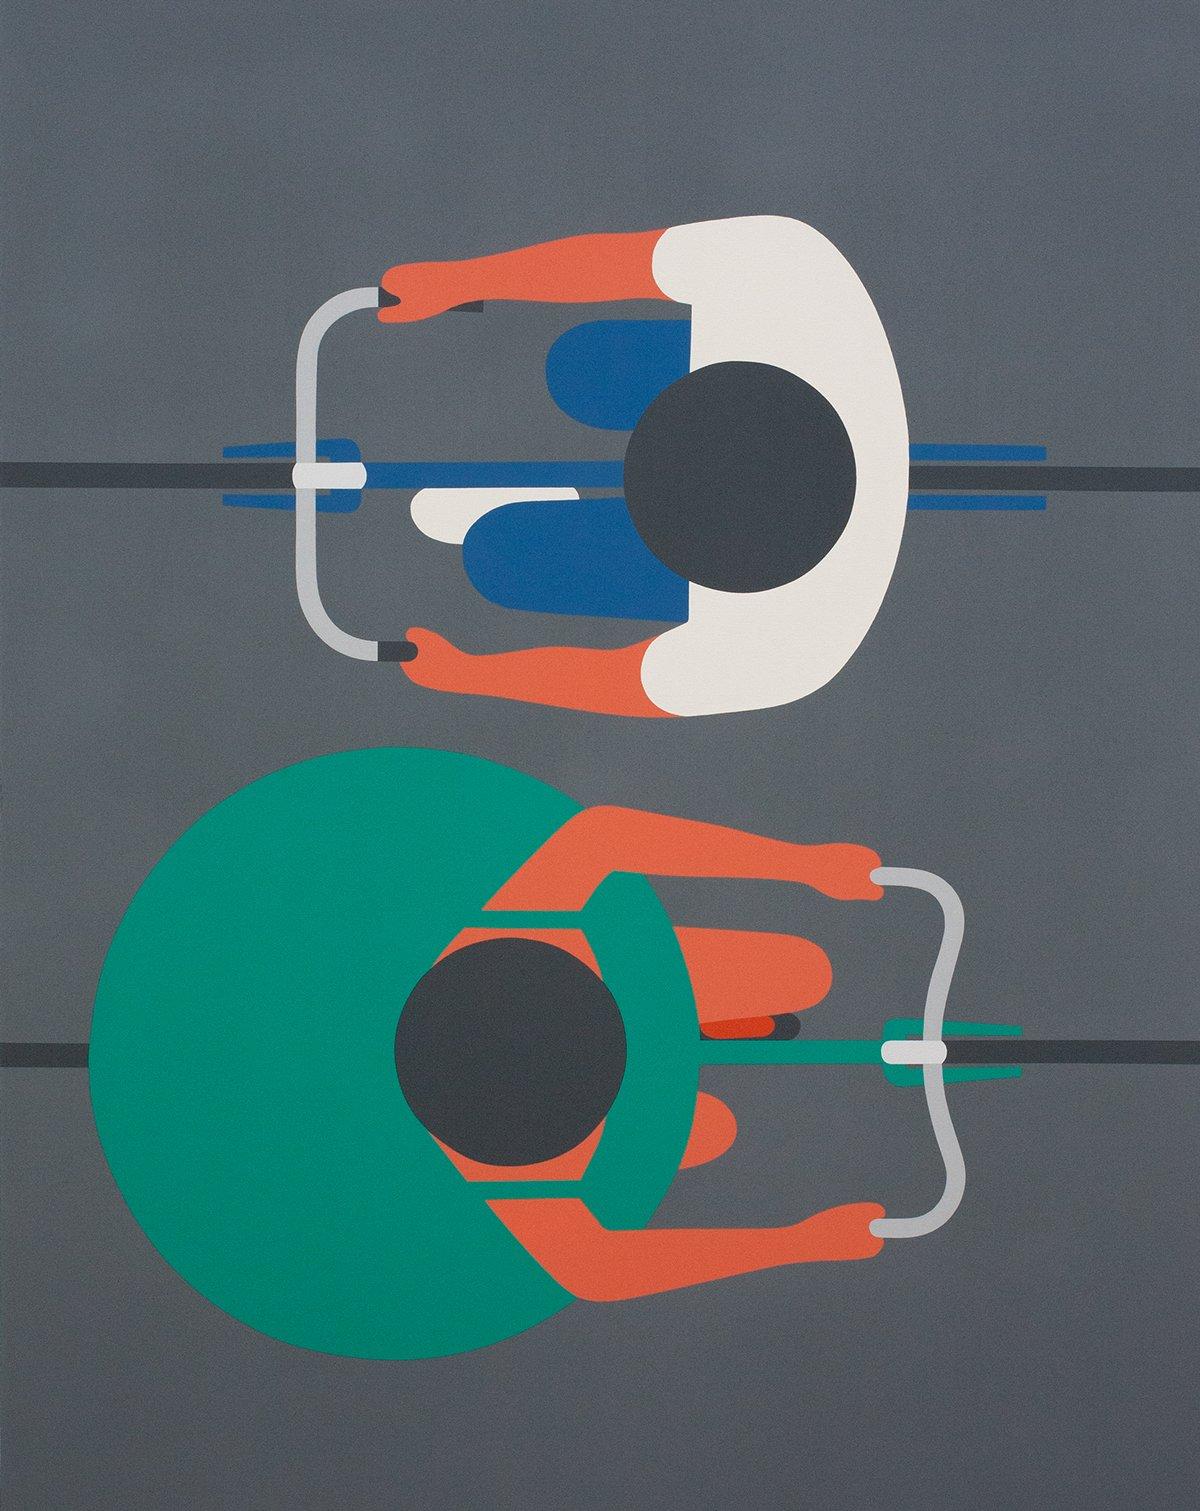 geoff_mcfetridge_paintings-designplayground_11